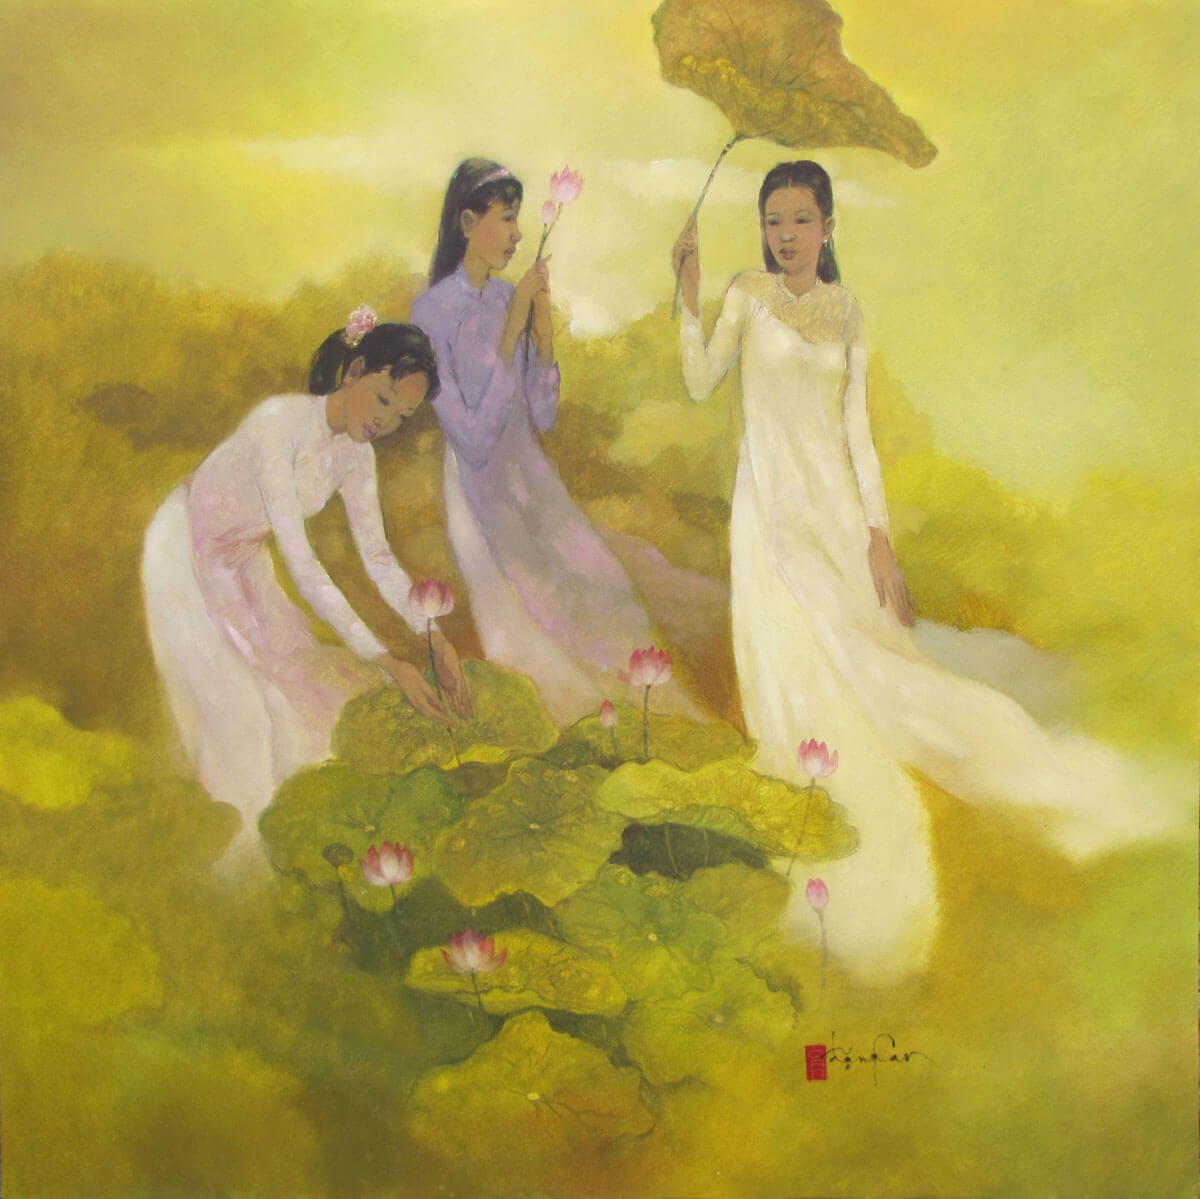 Ladies pick lotus flower | Lotus flower, Artist and Art google